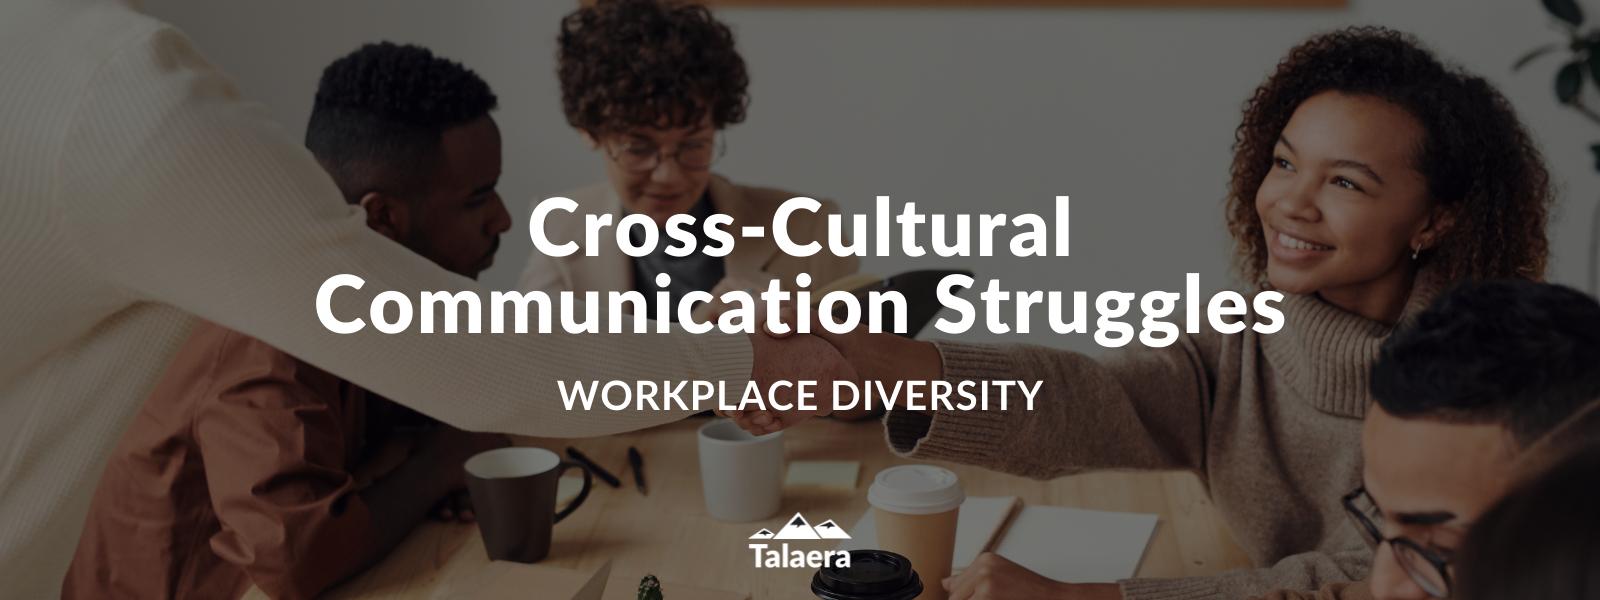 Cross-Cultural Communication Struggles - Talaera Business English